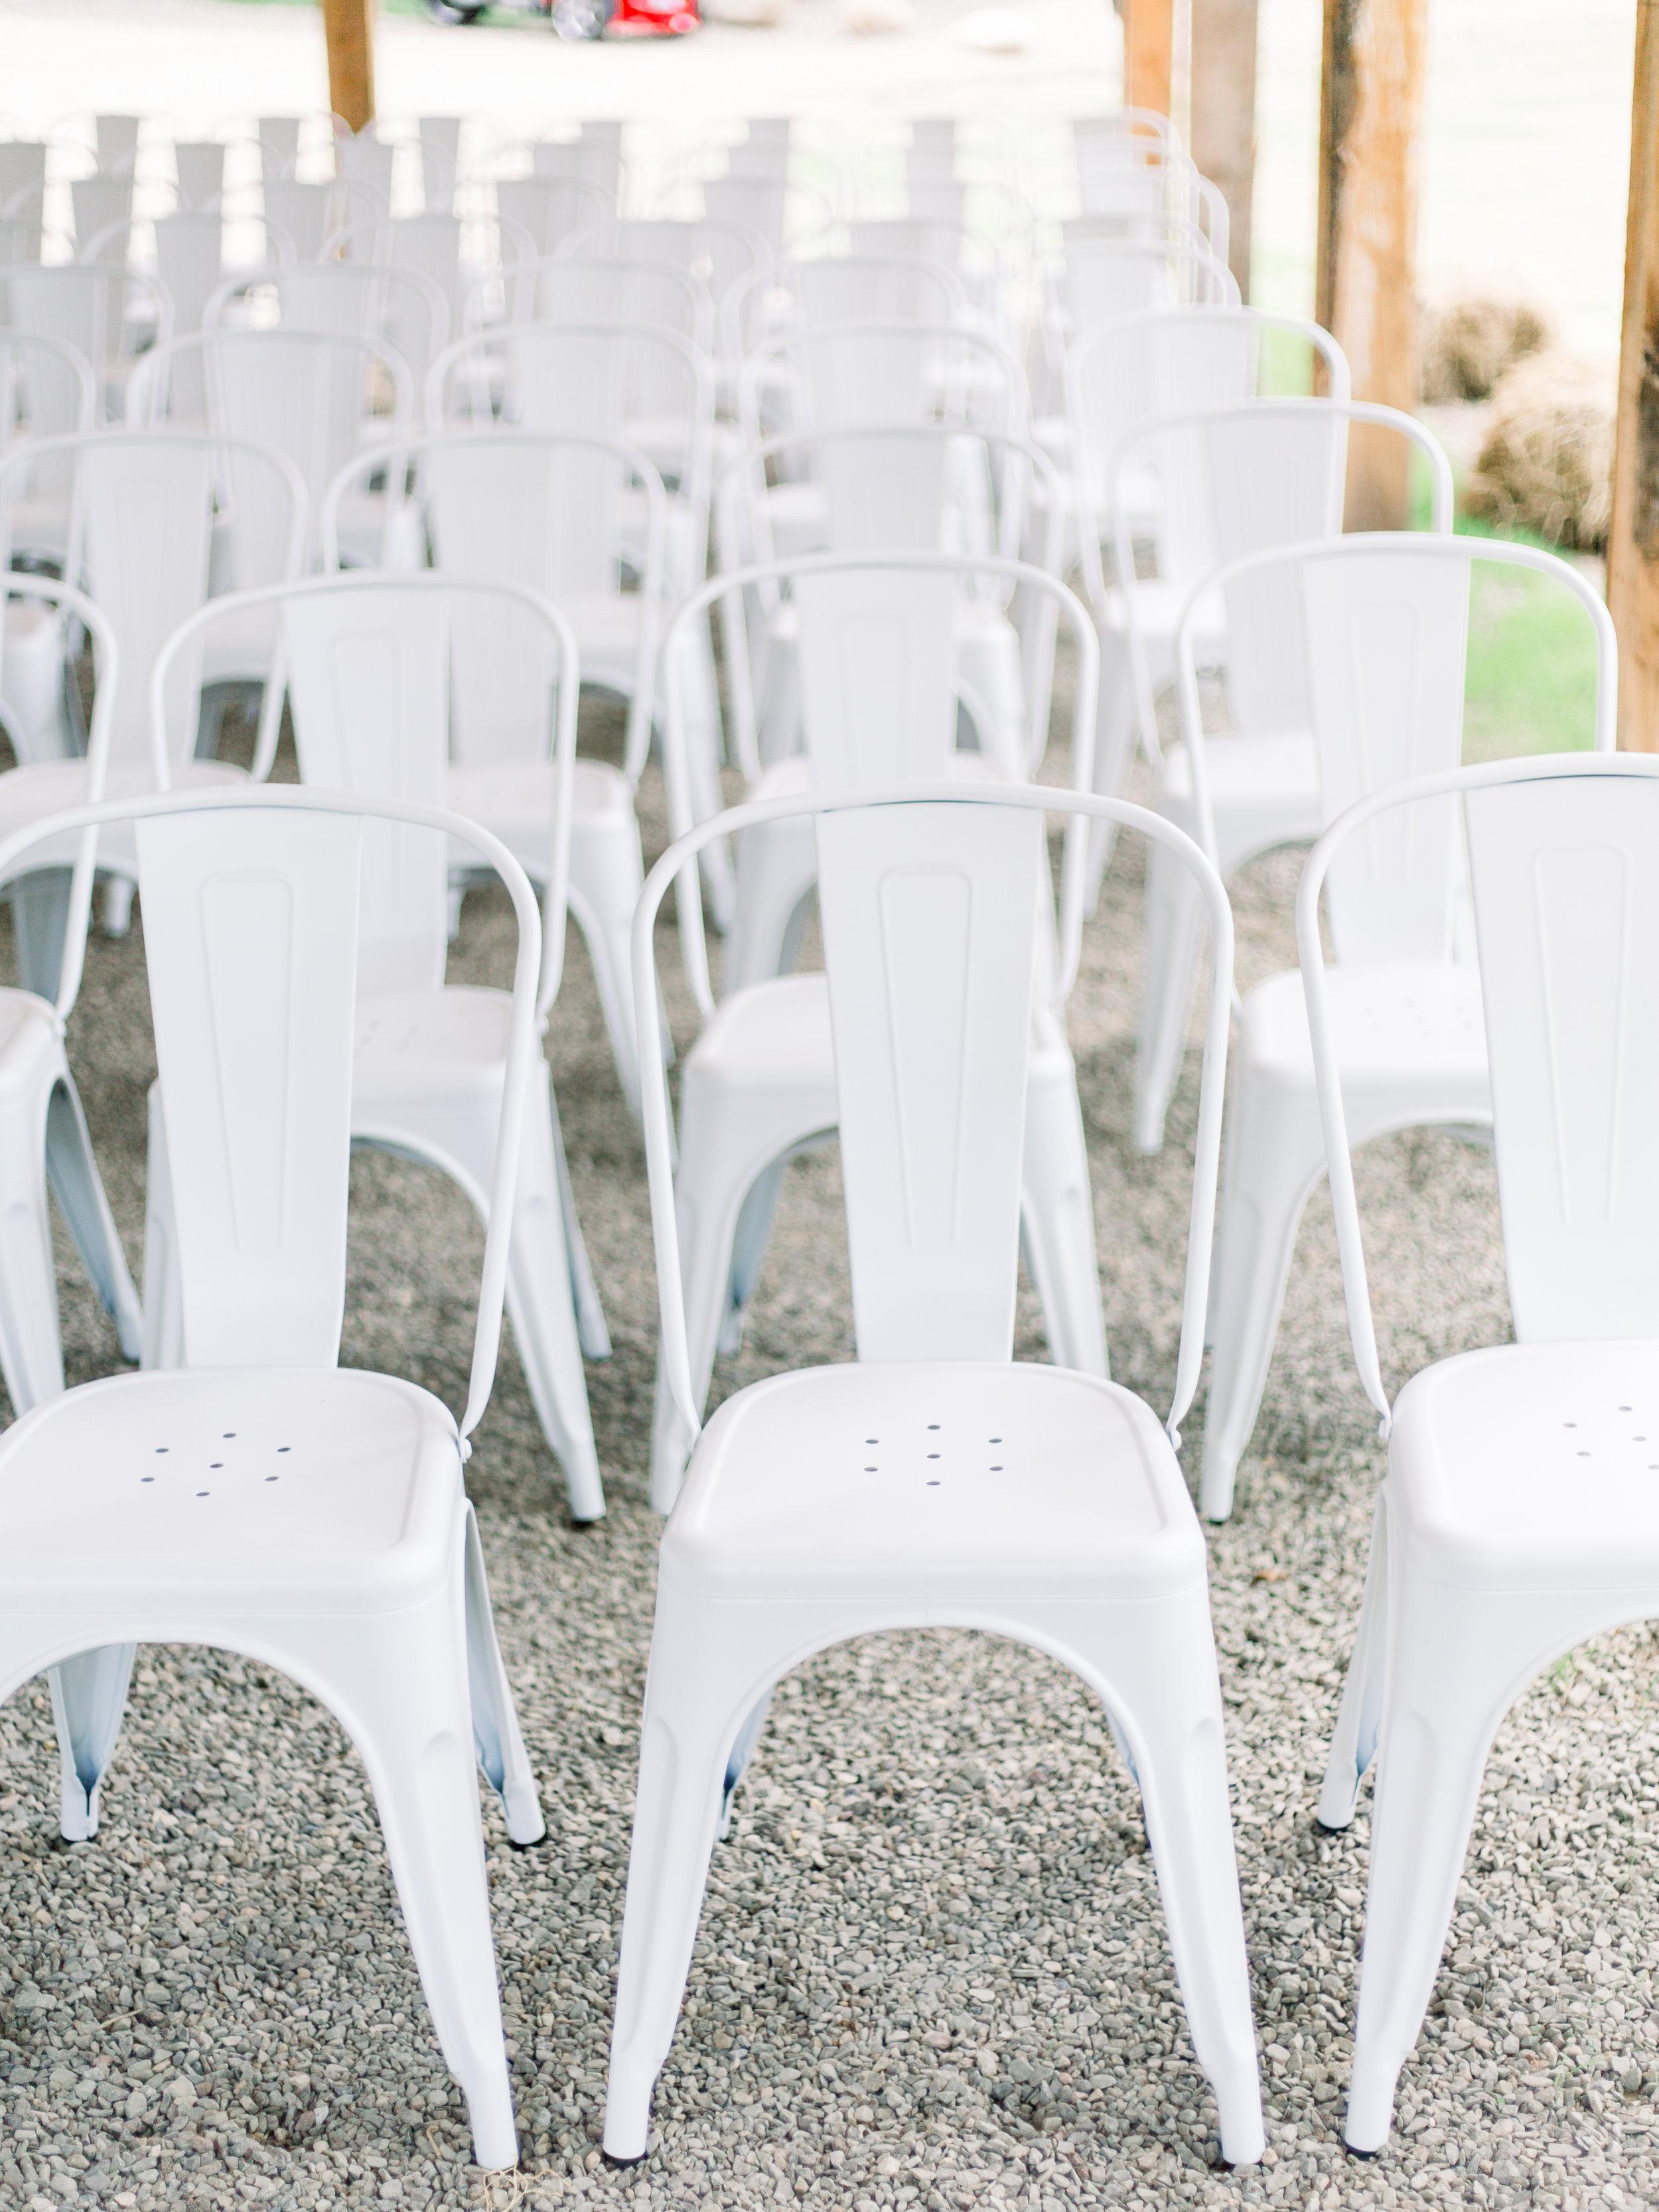 katie_graham_photography_ivory_acres_wedding_venue_frewsburg_new_york_wedding_venue_jamestown_bemus_point_photographer